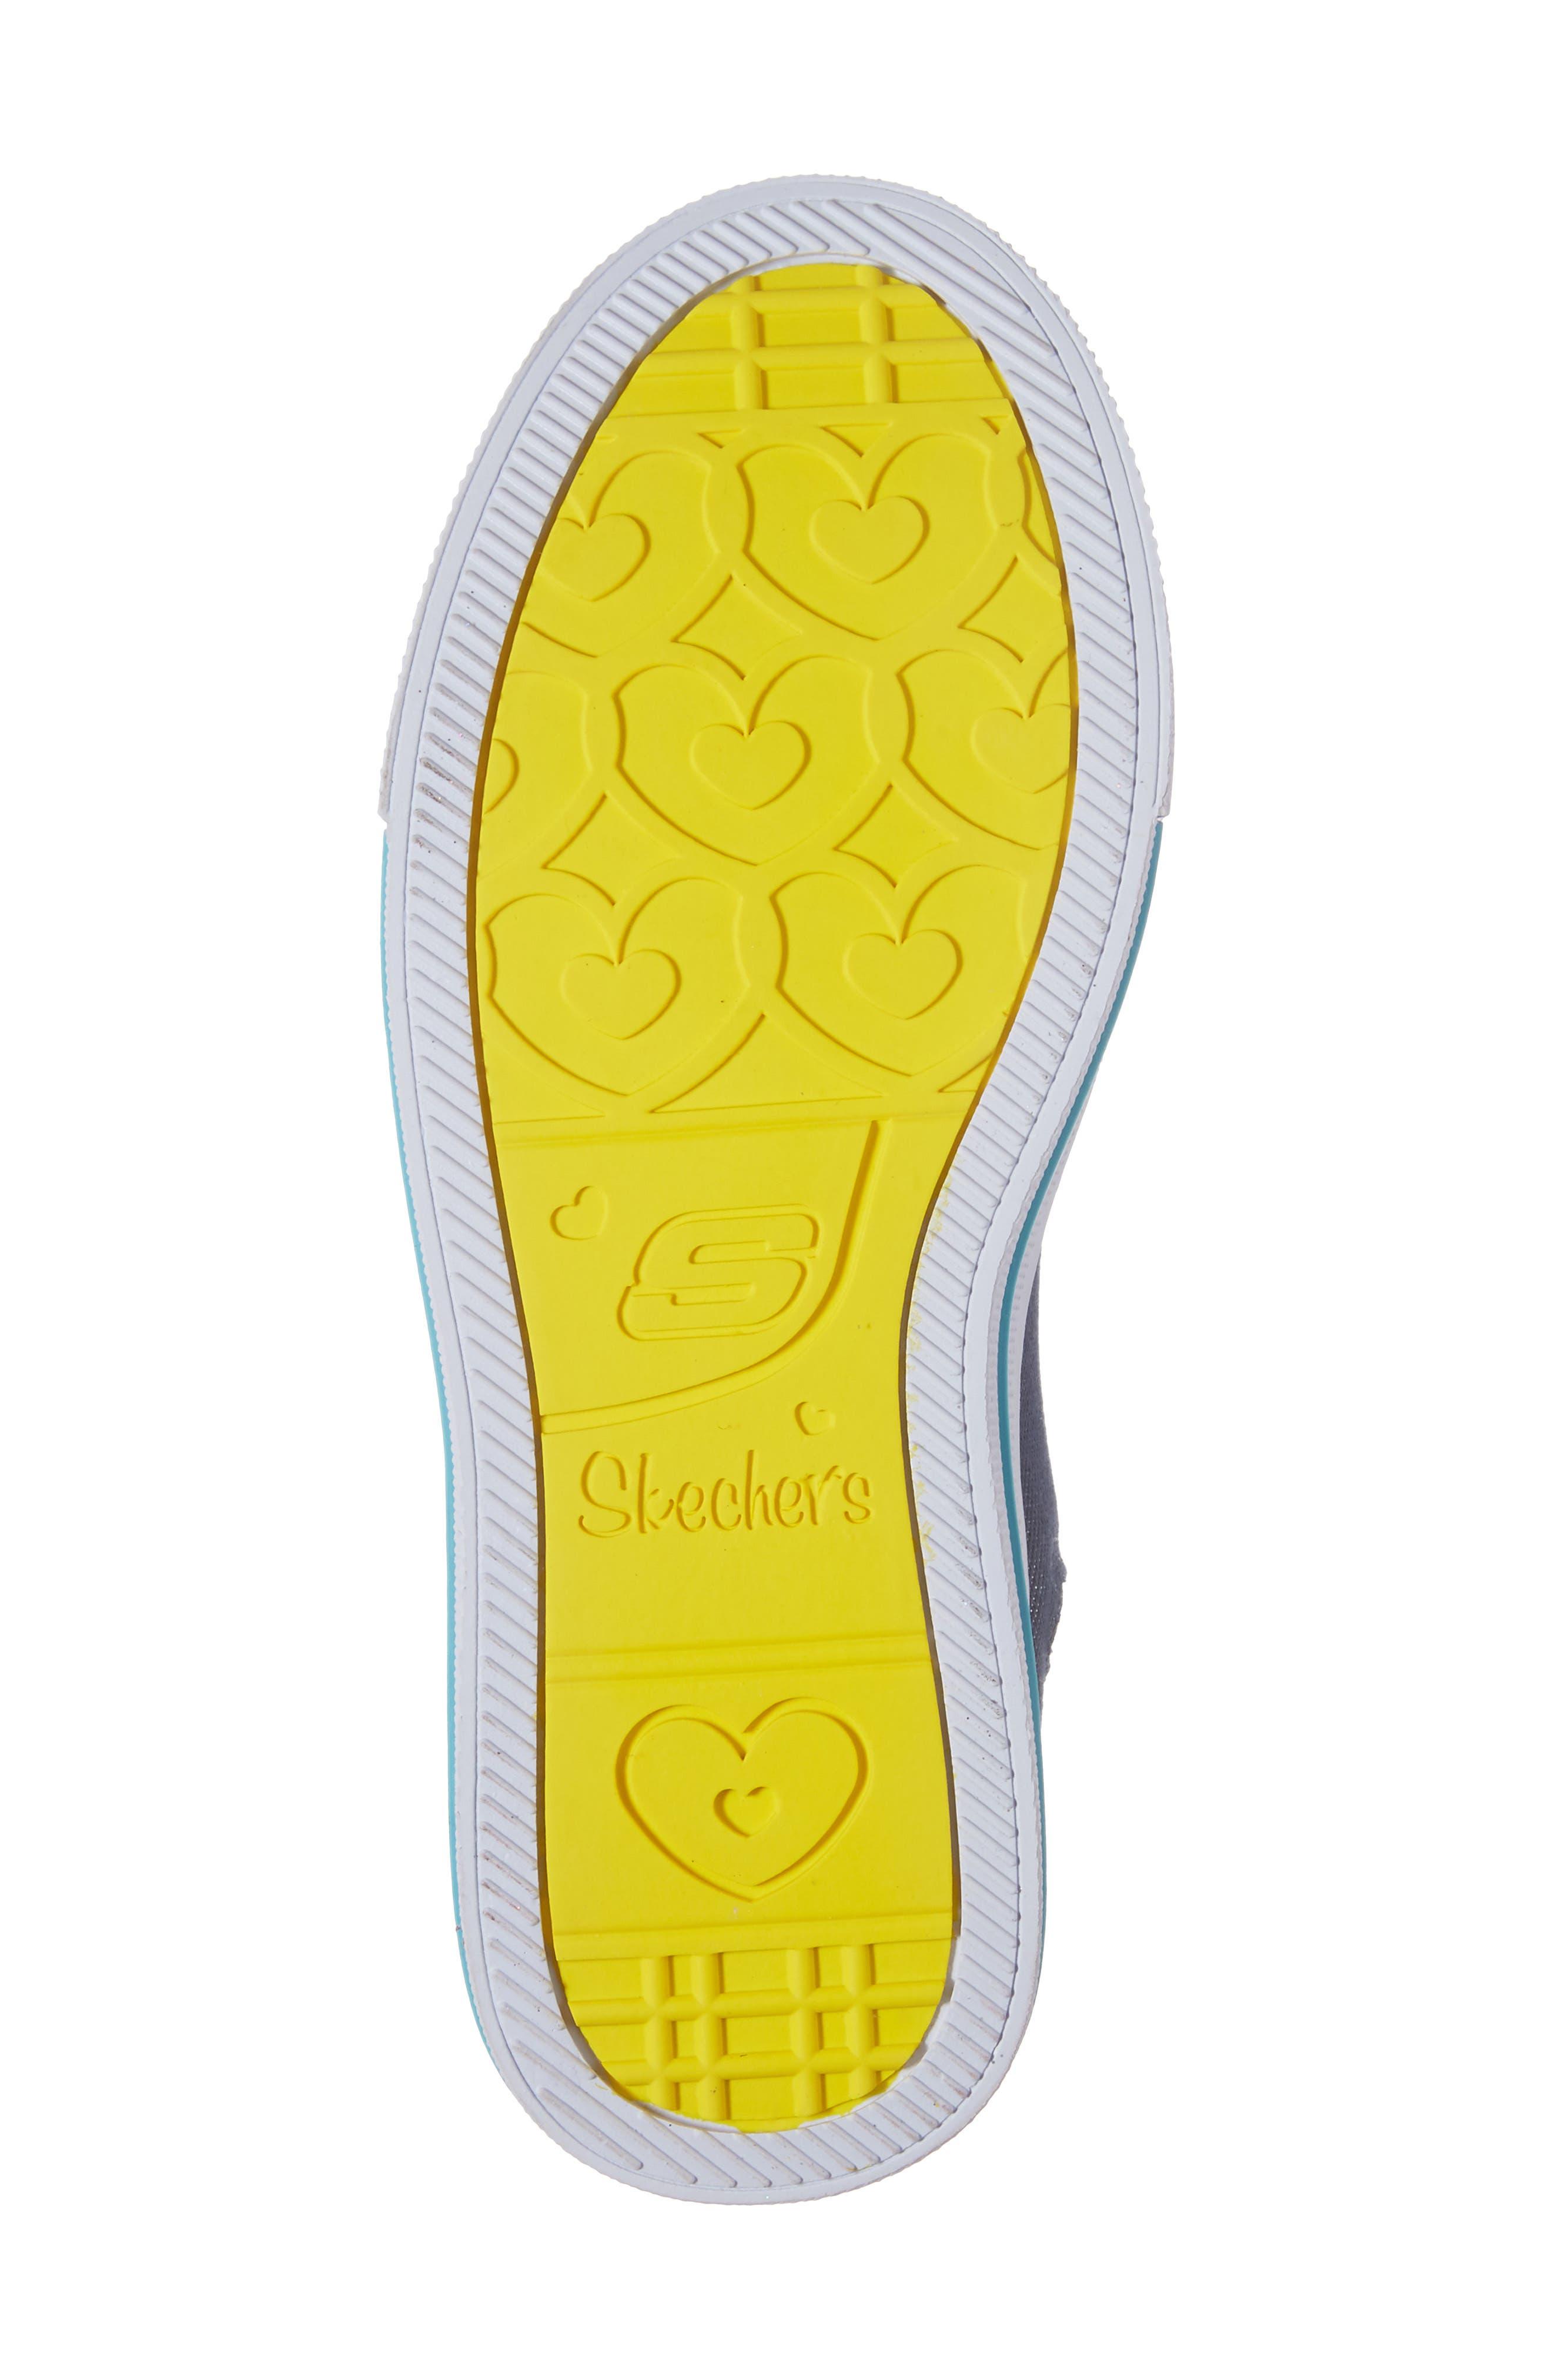 Twinkle Toes Shuffles Ultra High Top Sneaker,                             Alternate thumbnail 6, color,                             Denim/ Multi